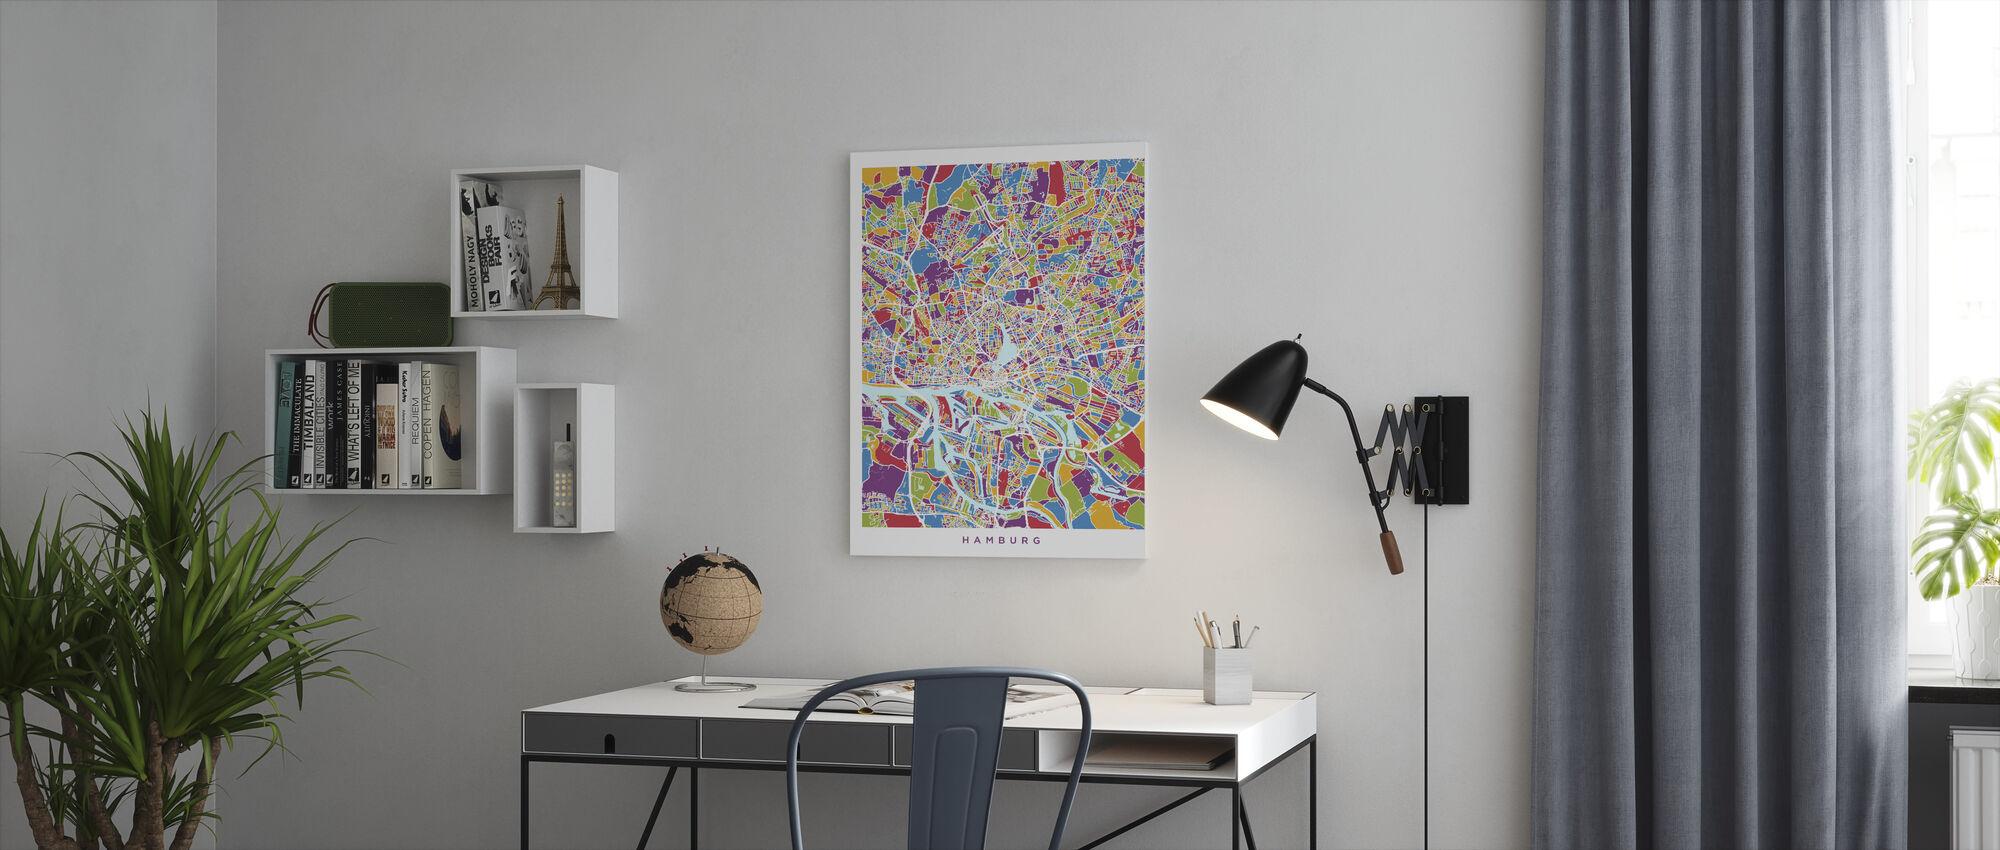 Hamburg Duitsland City Kaart - Canvas print - Kantoor